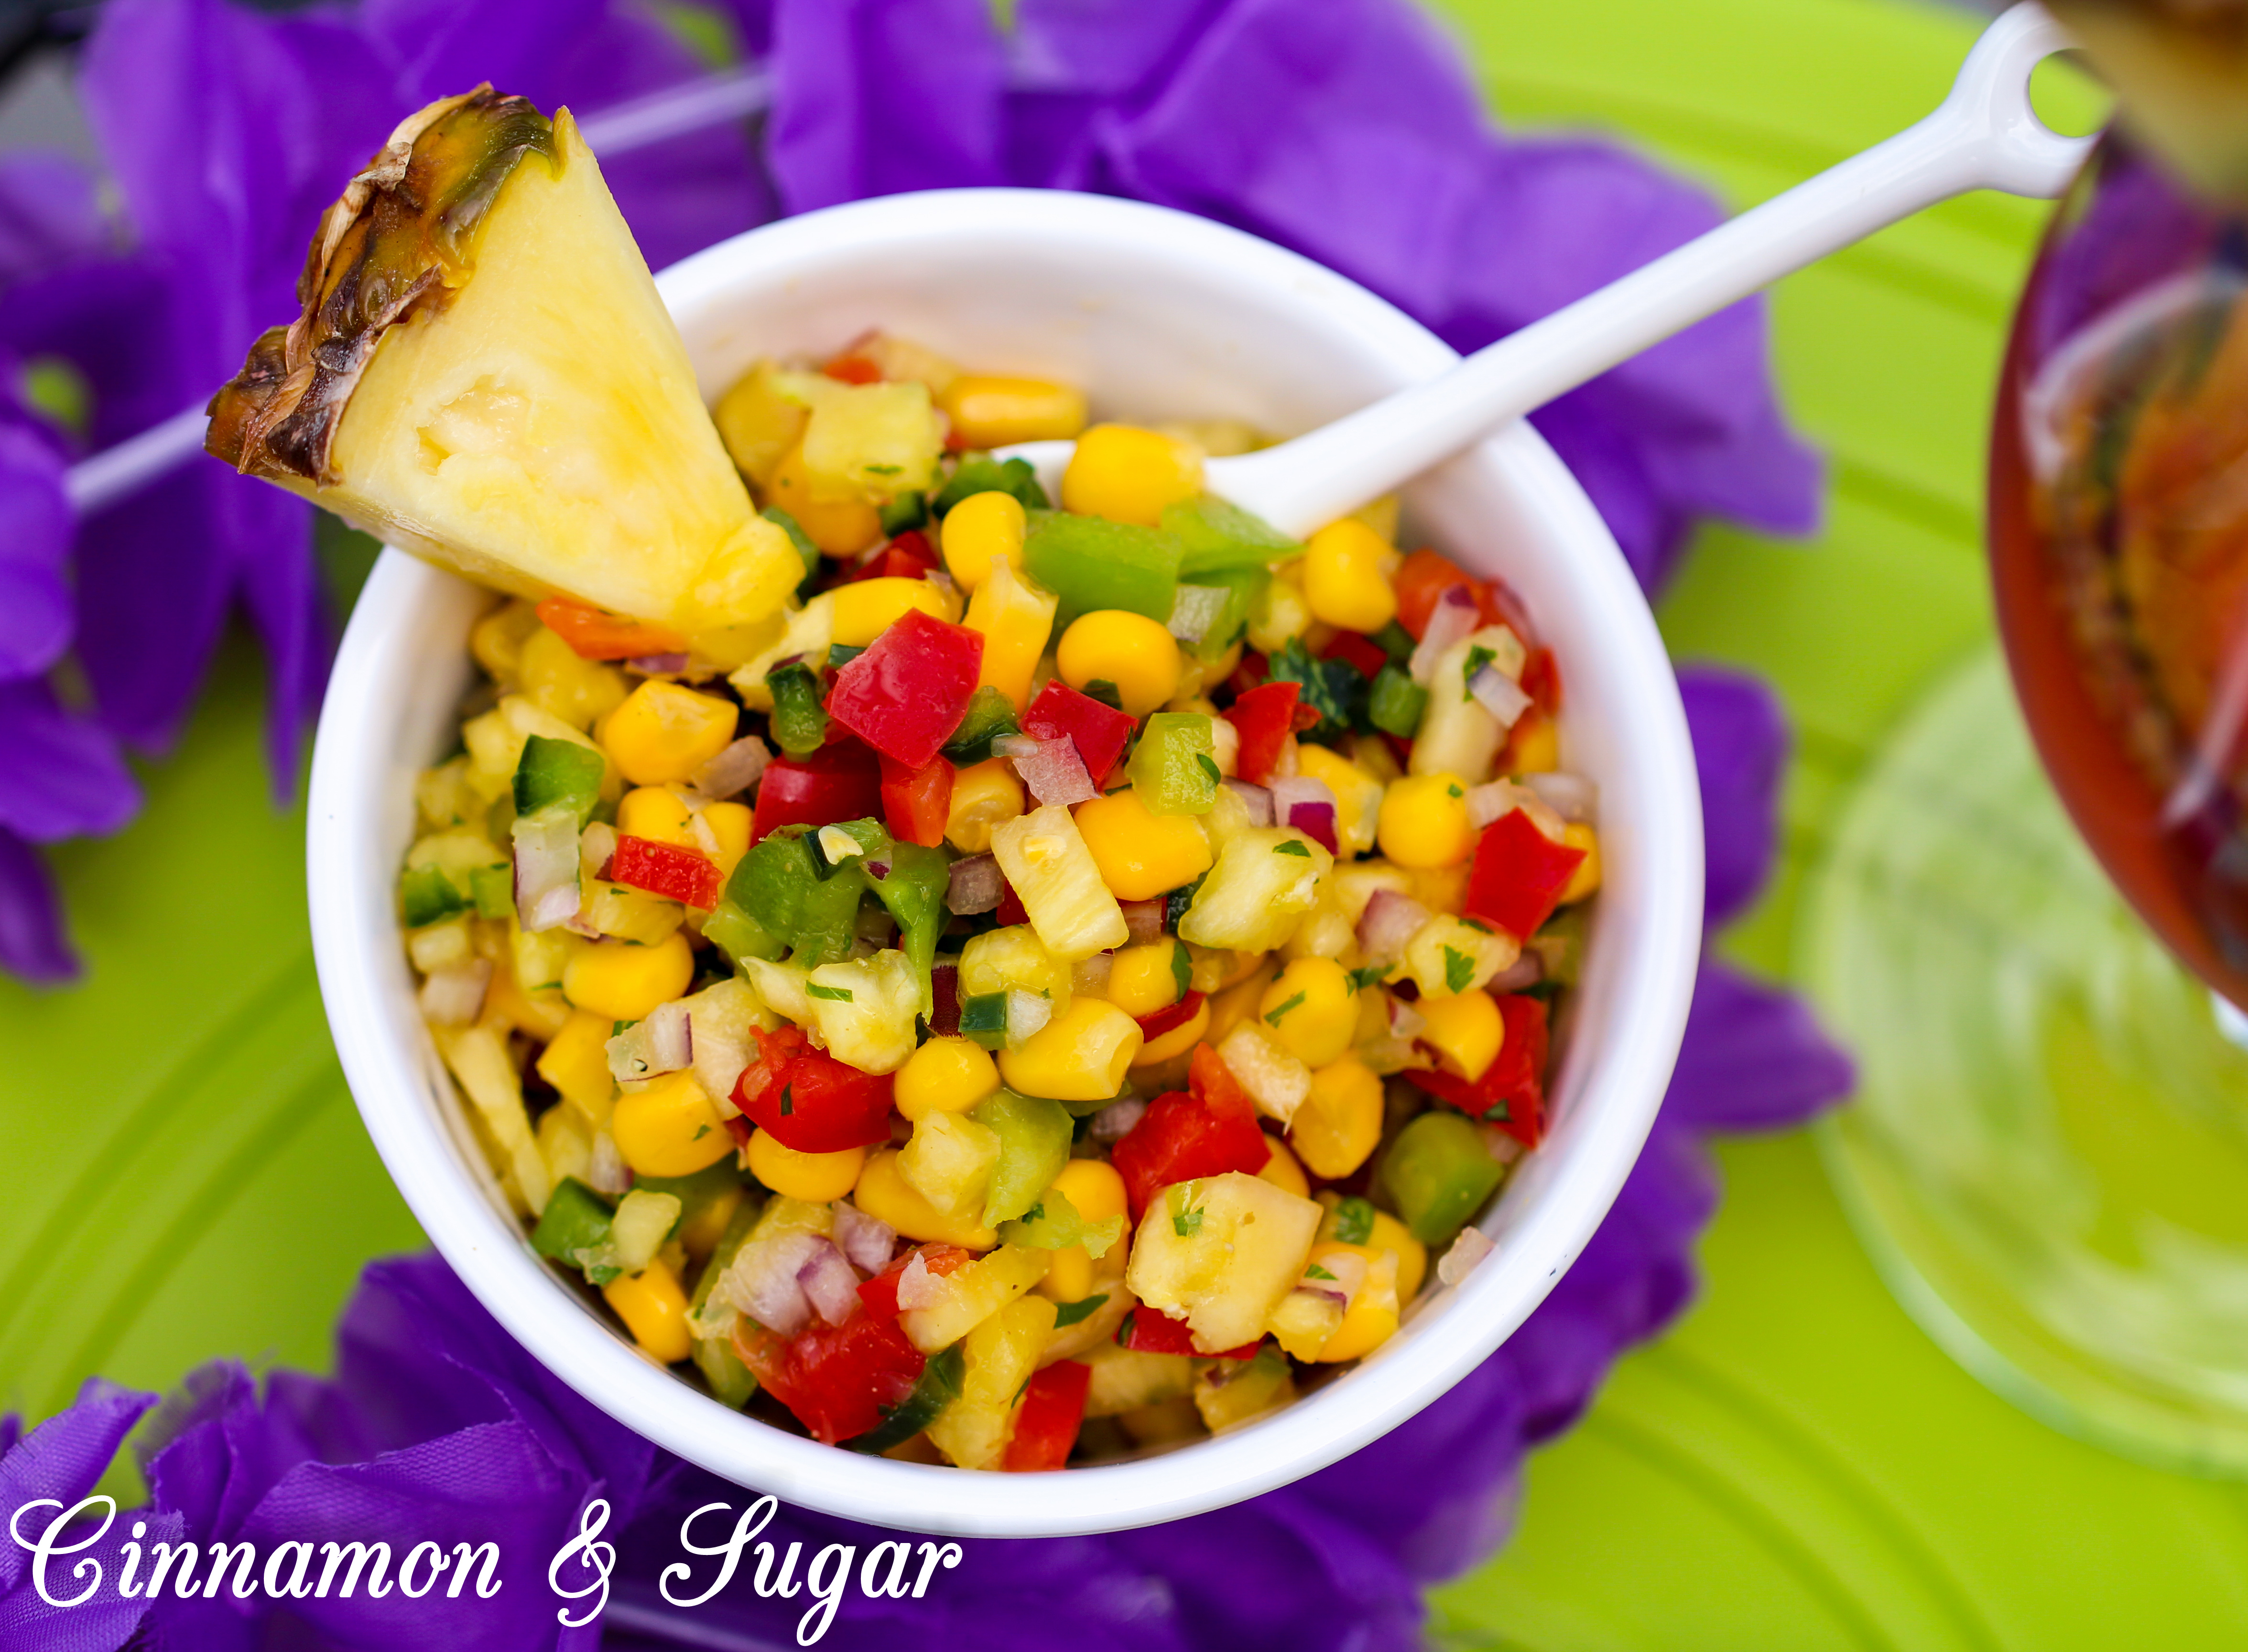 Poncho's Pineapple Salsa